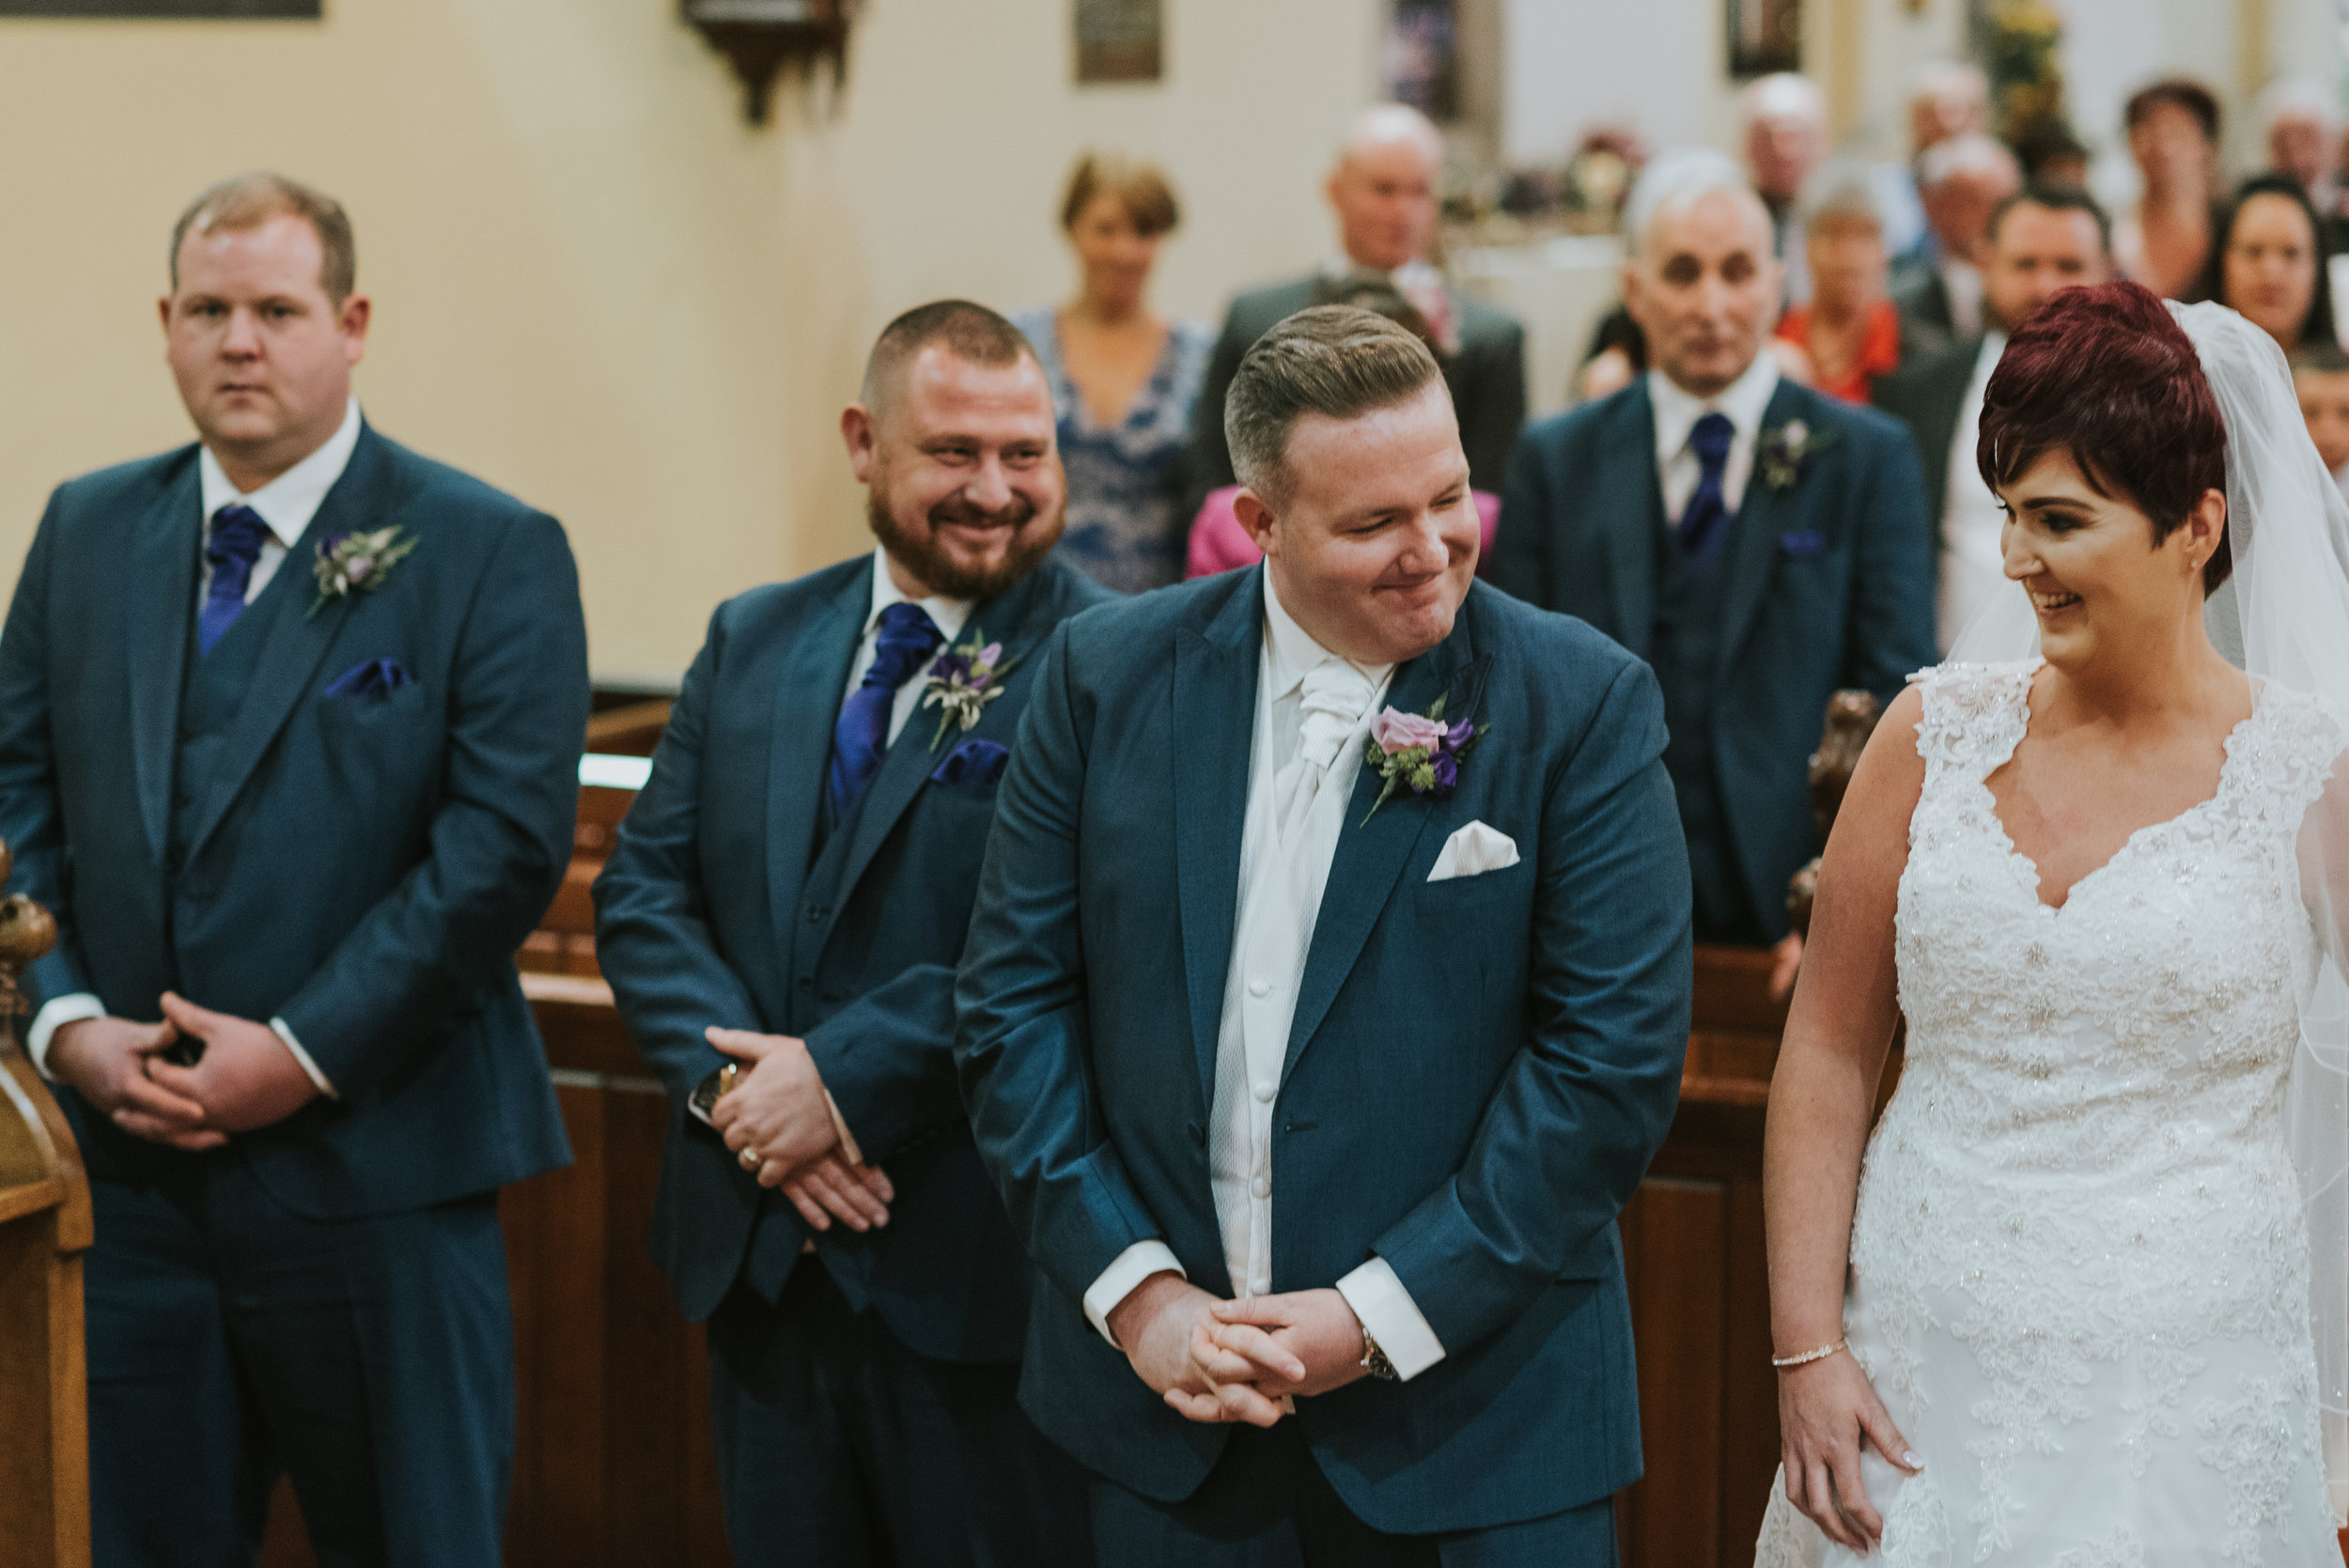 Christ Church Limavady wedding photographer Pure Photo N.I bride groom aisle